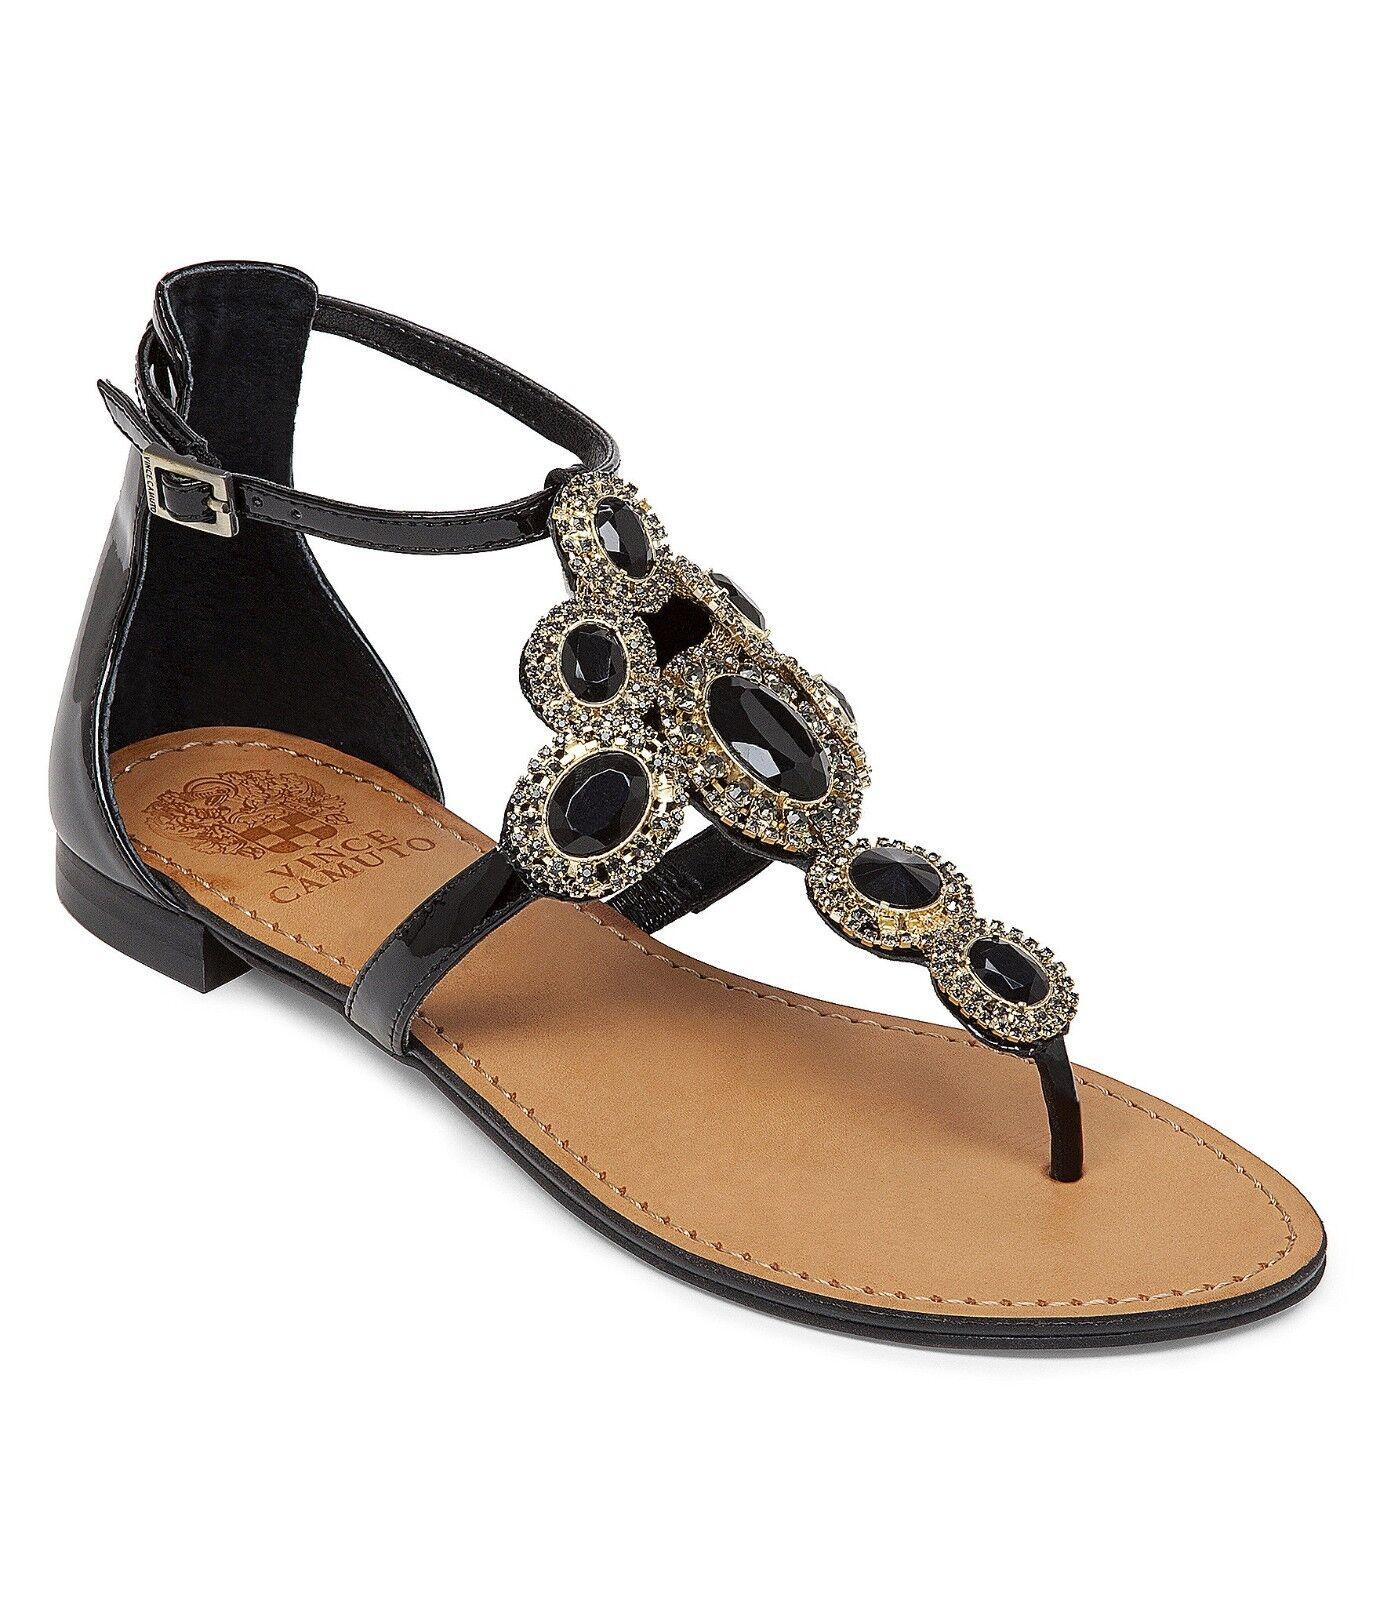 Vince Camuto Manelle Jeweled Sandals Women Sizes 6-9 Black Kid Patent VC-MANELLE